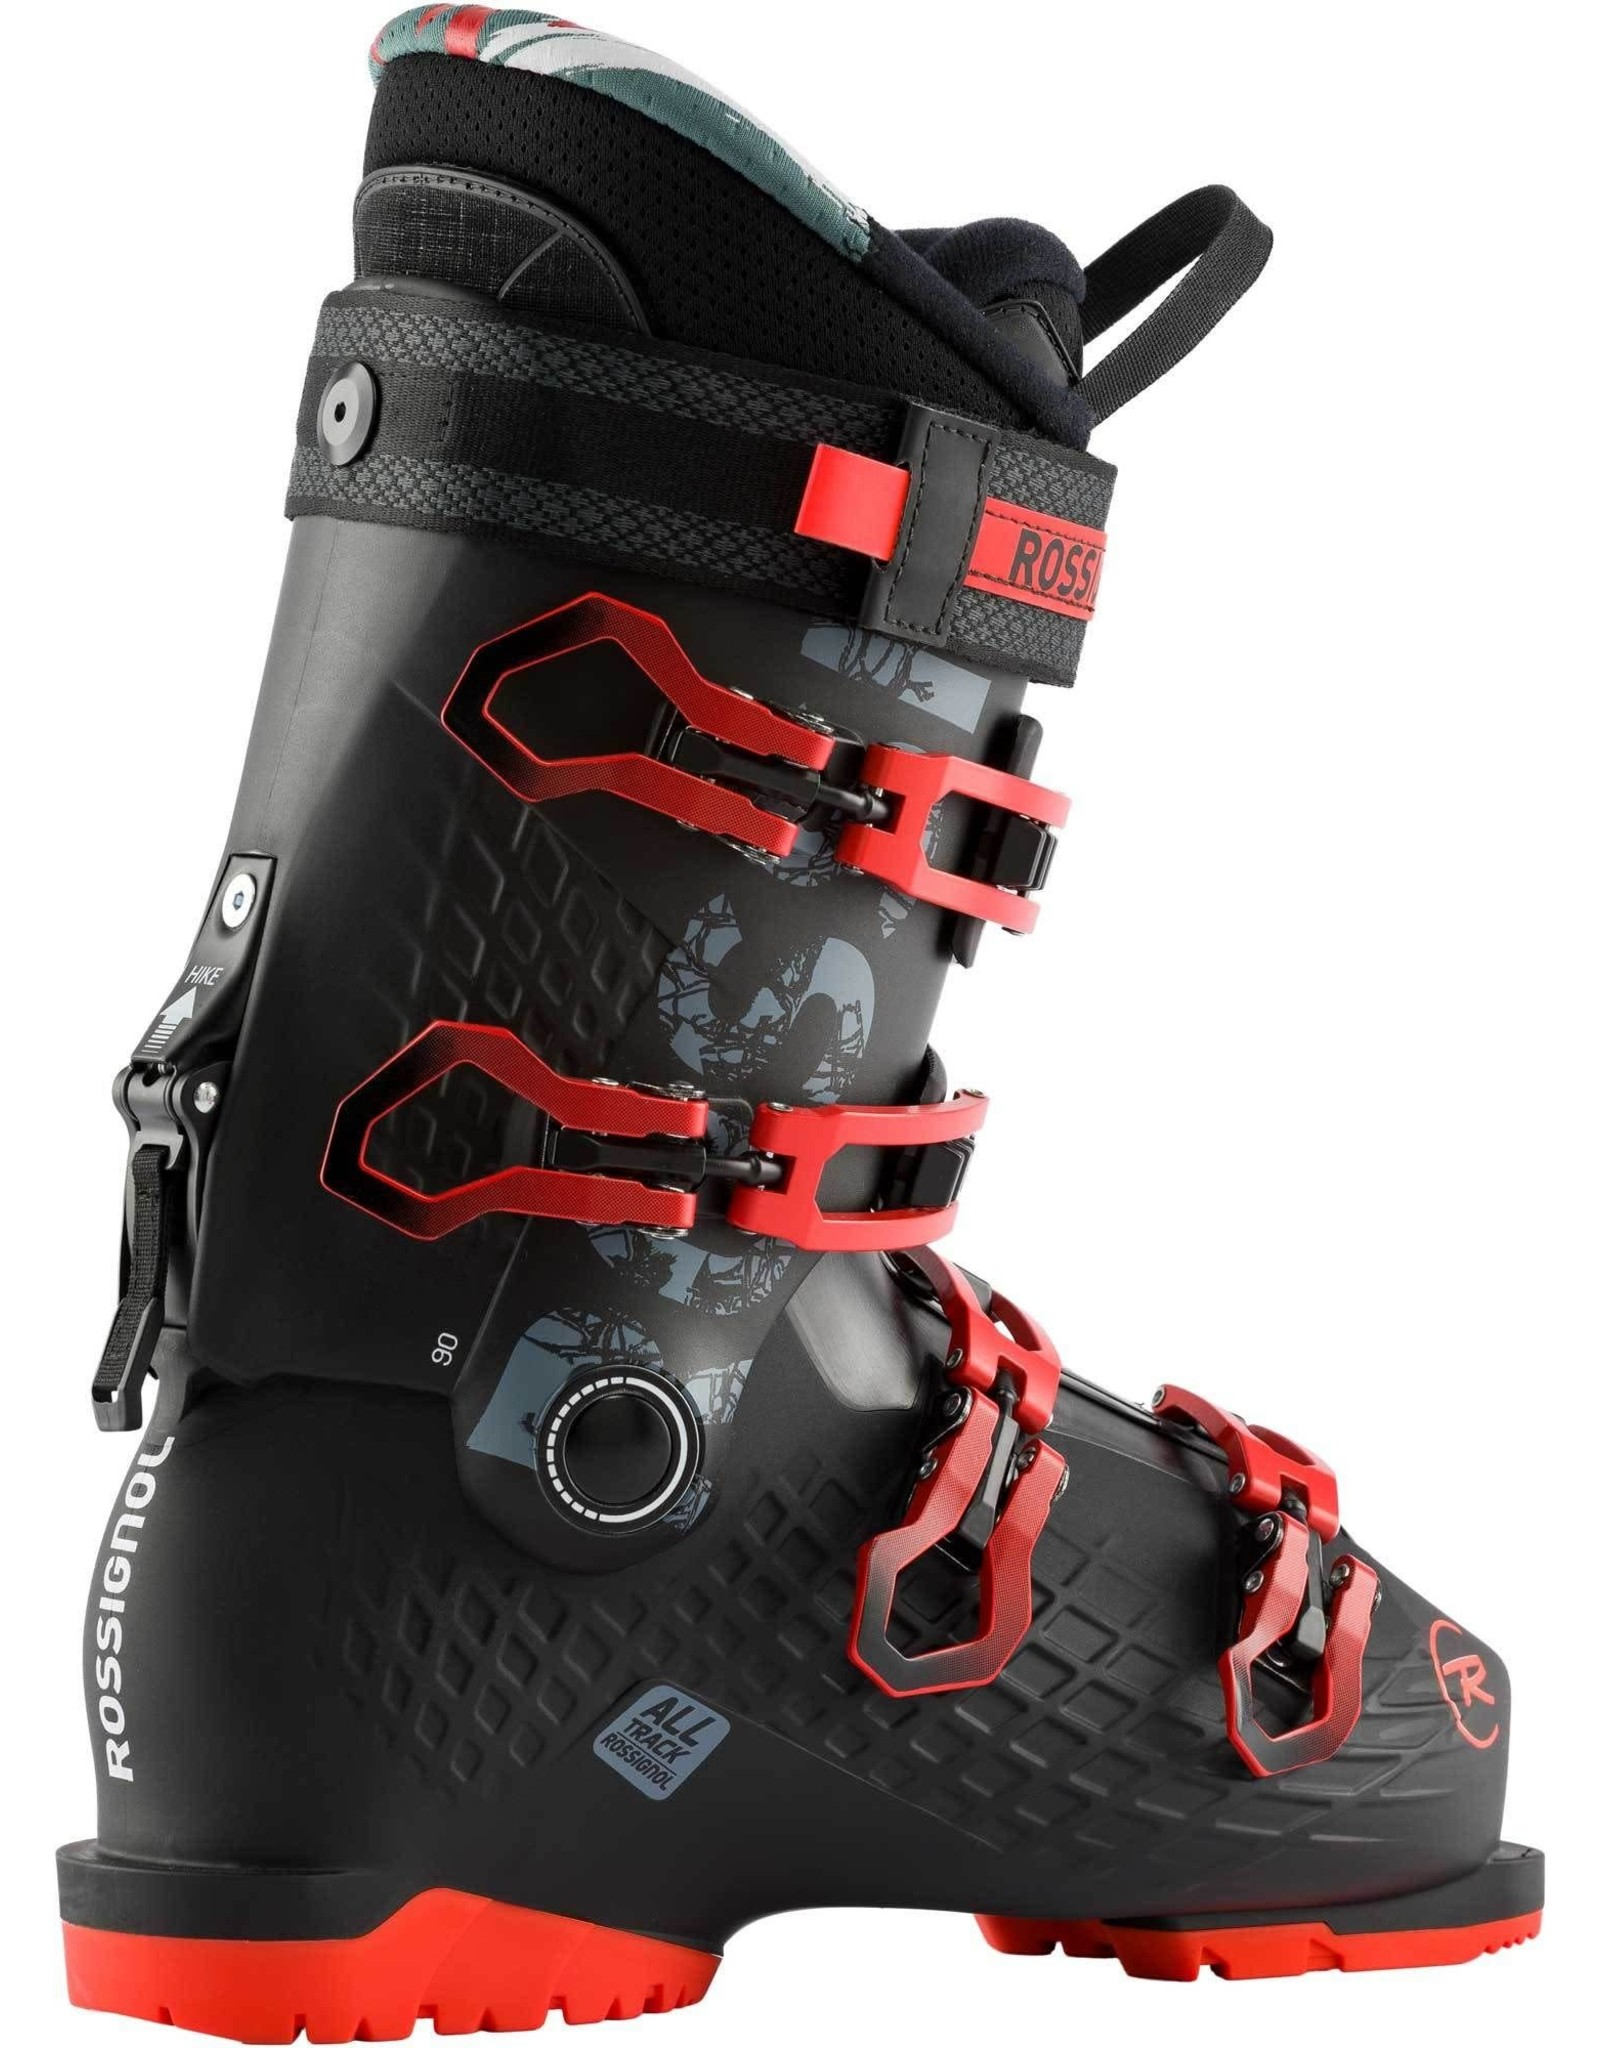 ROSSIGNOL ROSSIGNOL ALLTRACK 90 BLACK/RED ALPINE SKI BOOT MEN 20